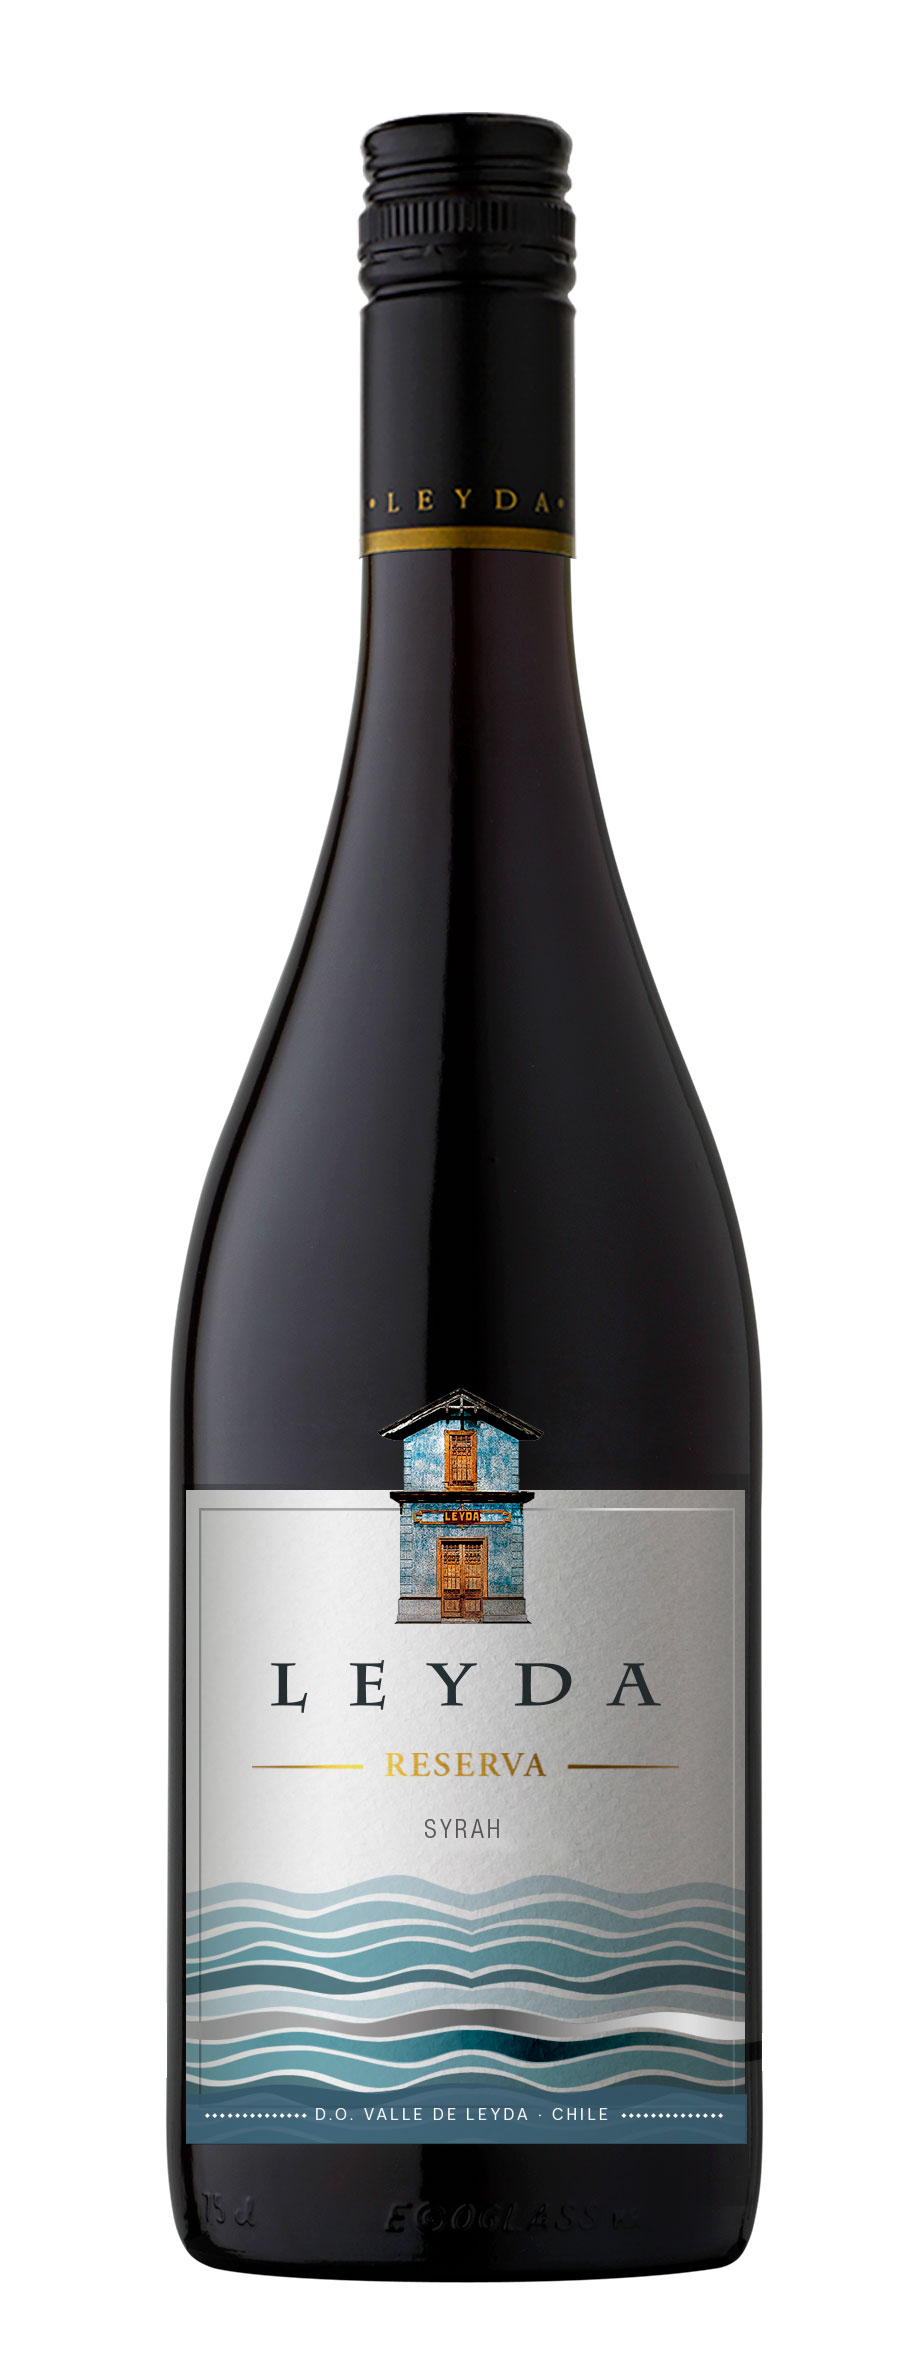 Wine Viña Leyda Reserva Syrah 2019